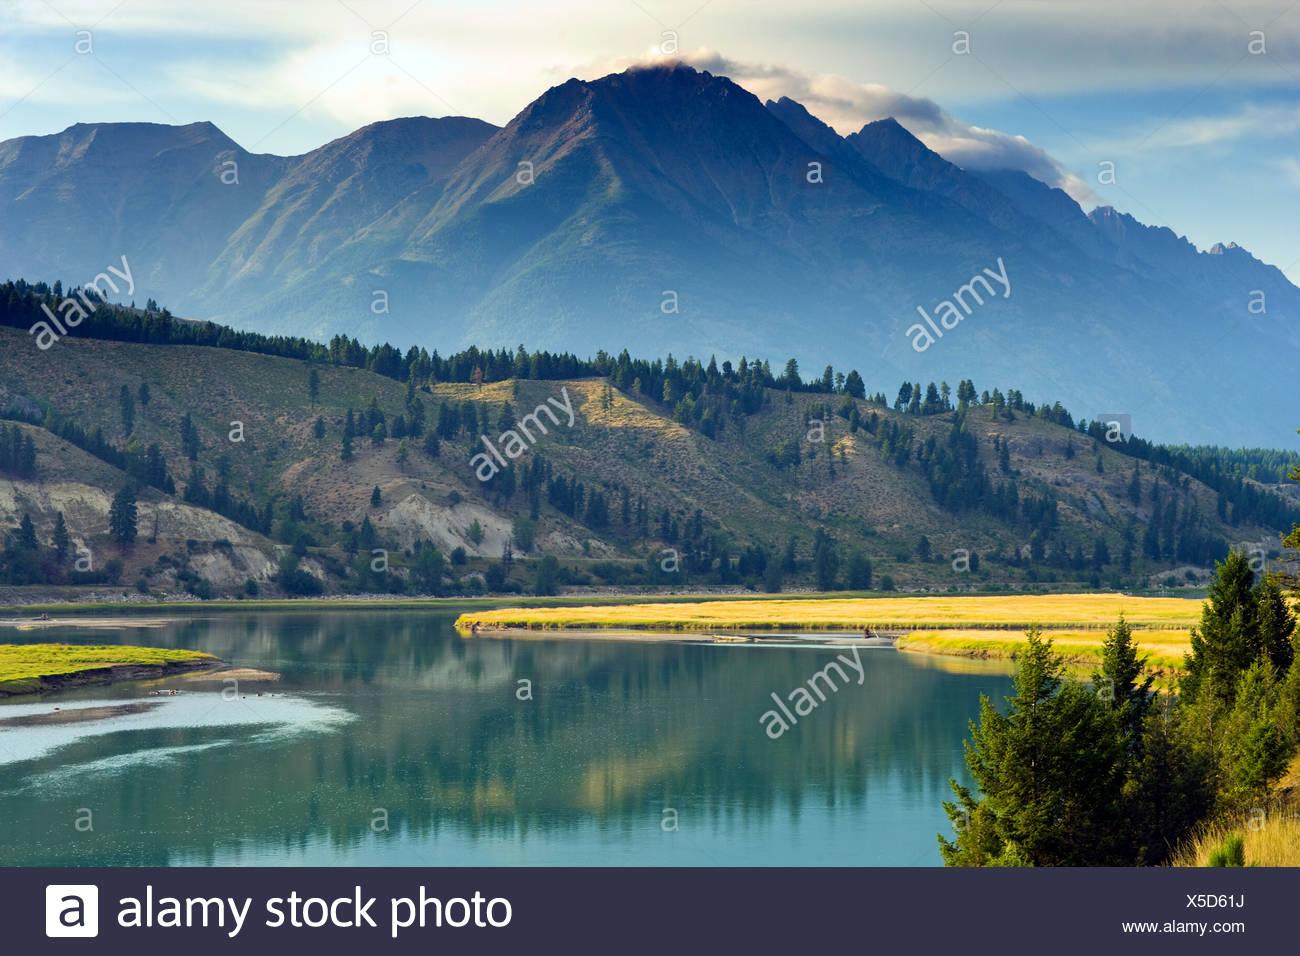 Kootenay River, British Columbia, Canada, mountain - Stock Image